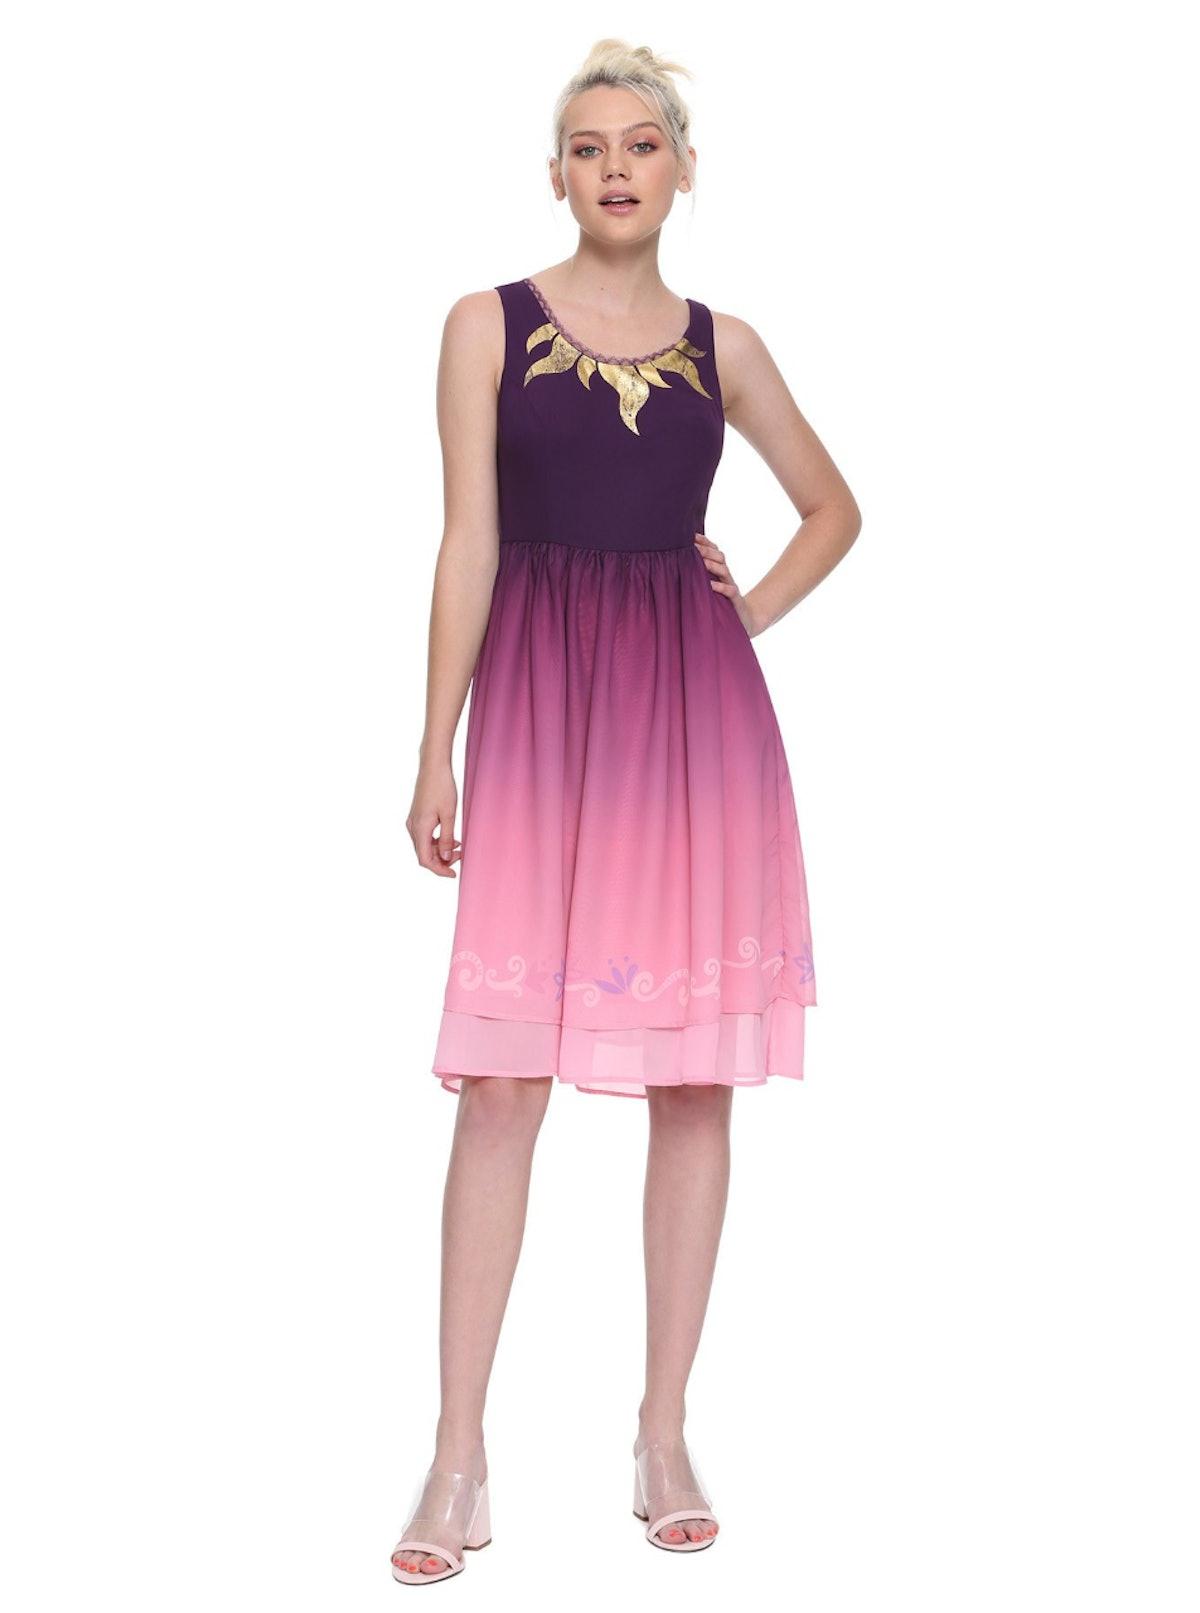 Tangled Ombré Dress